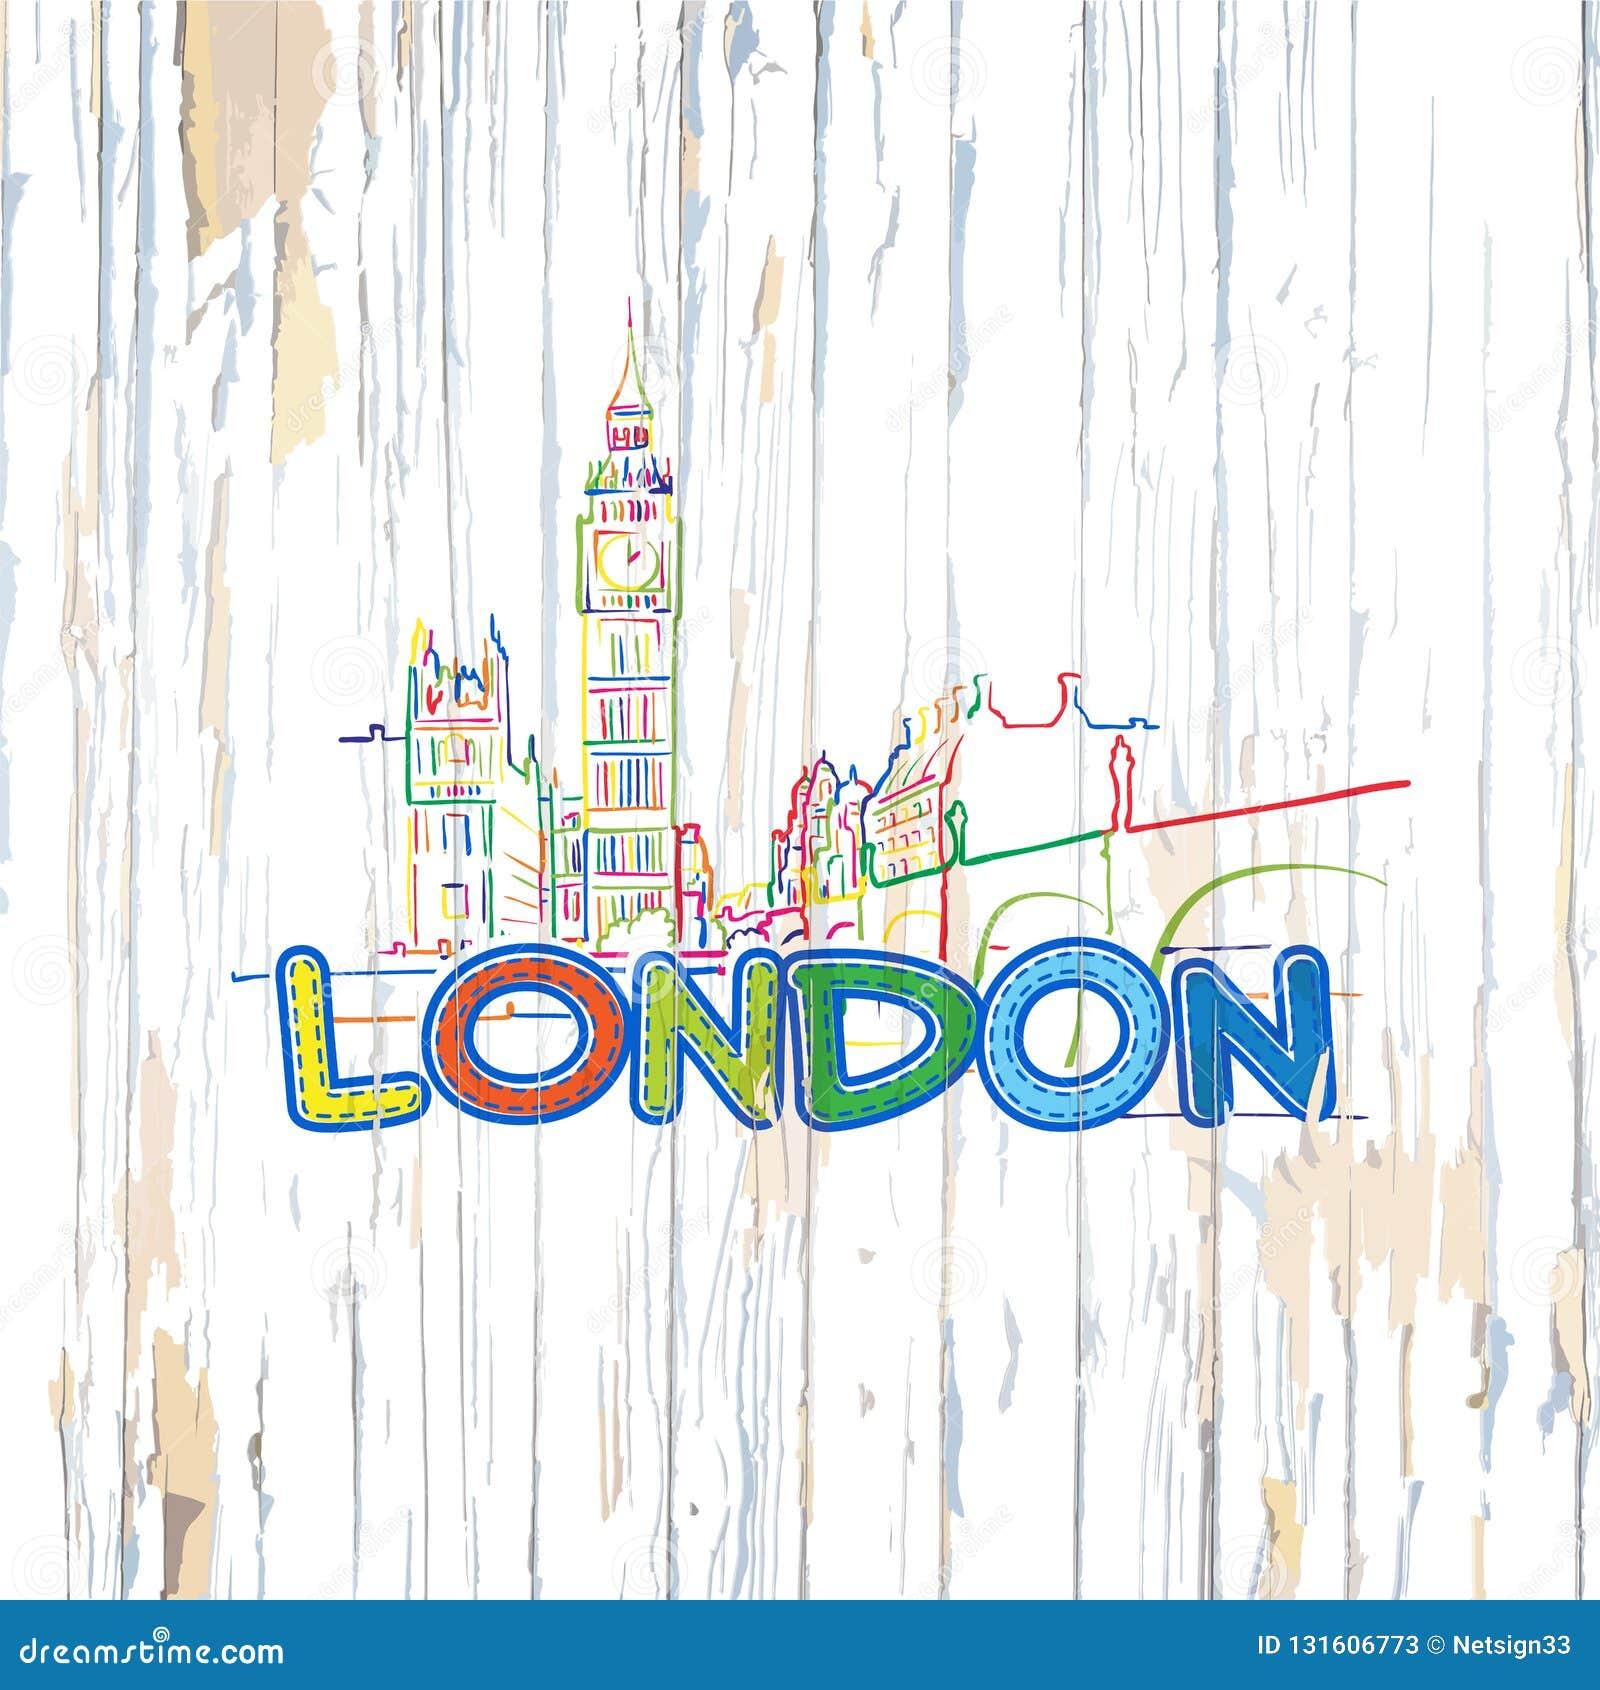 Dibujo colorido de Londres en fondo de madera